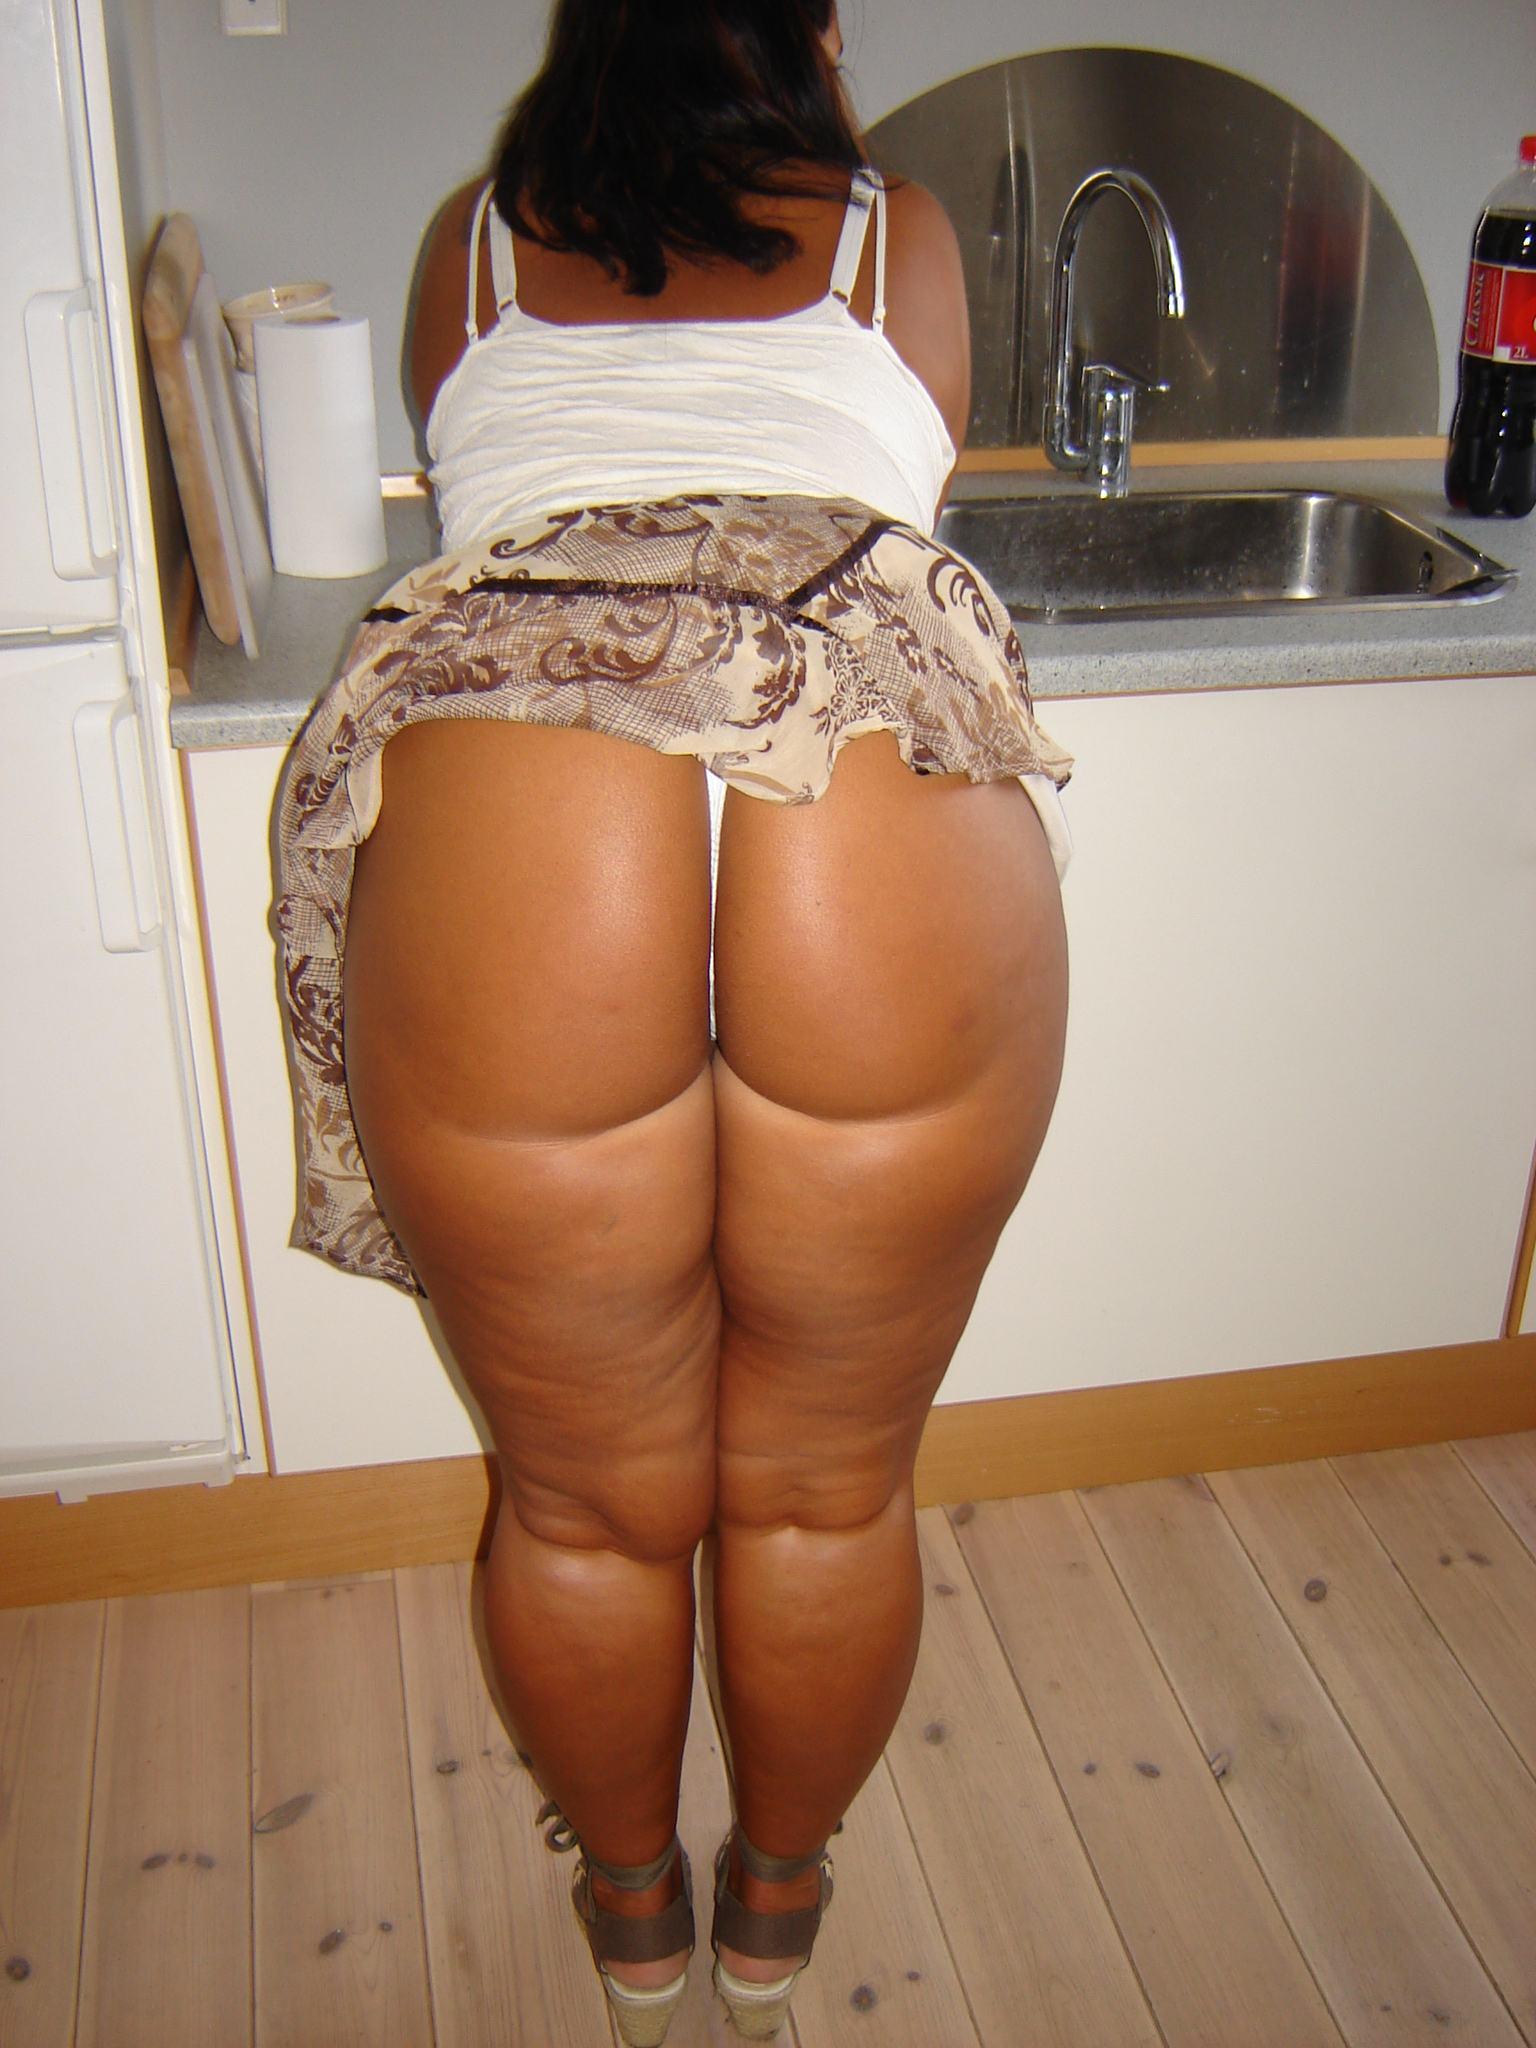 2 chubby german semi bimen with older woman 7